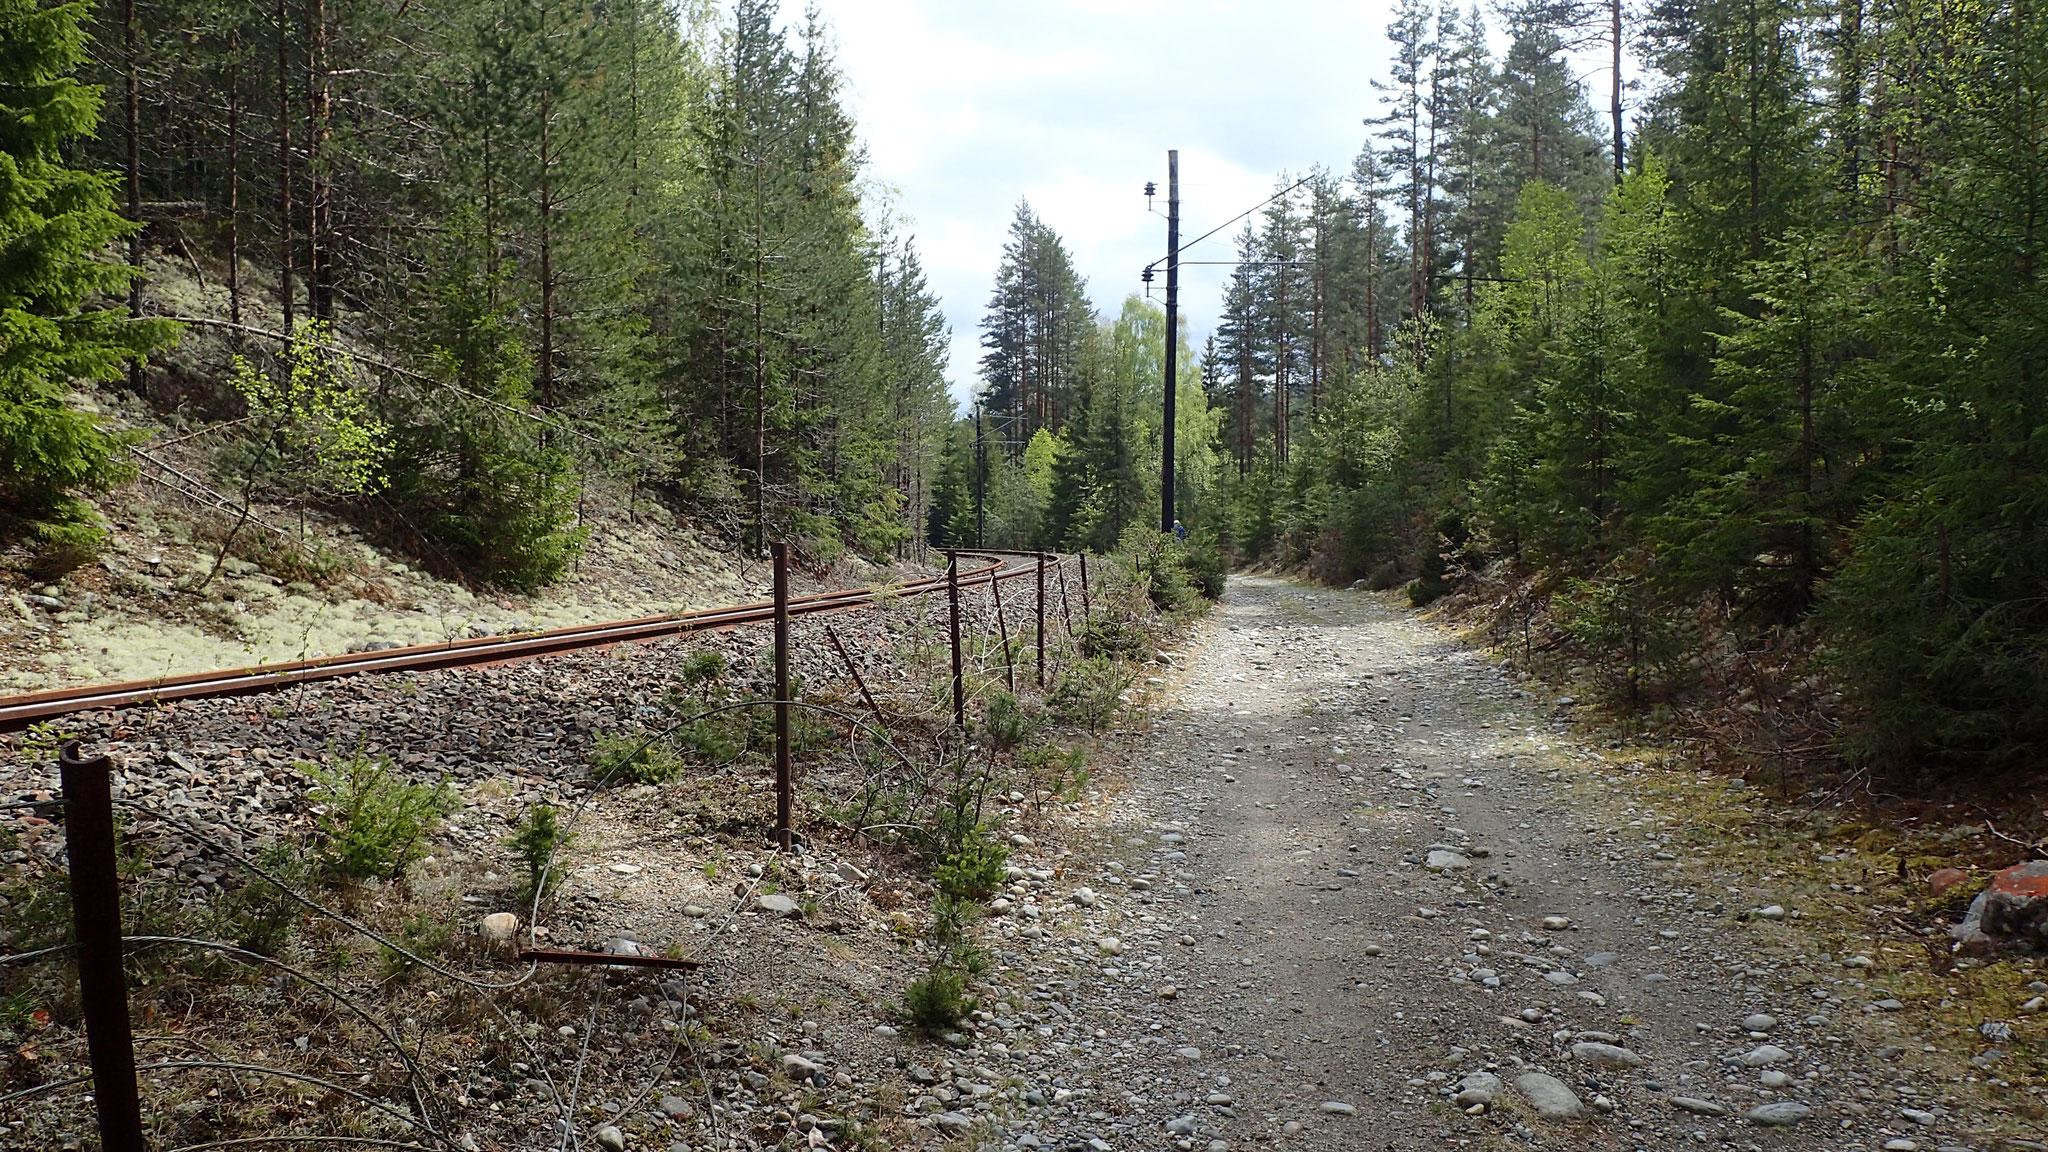 along the railway line